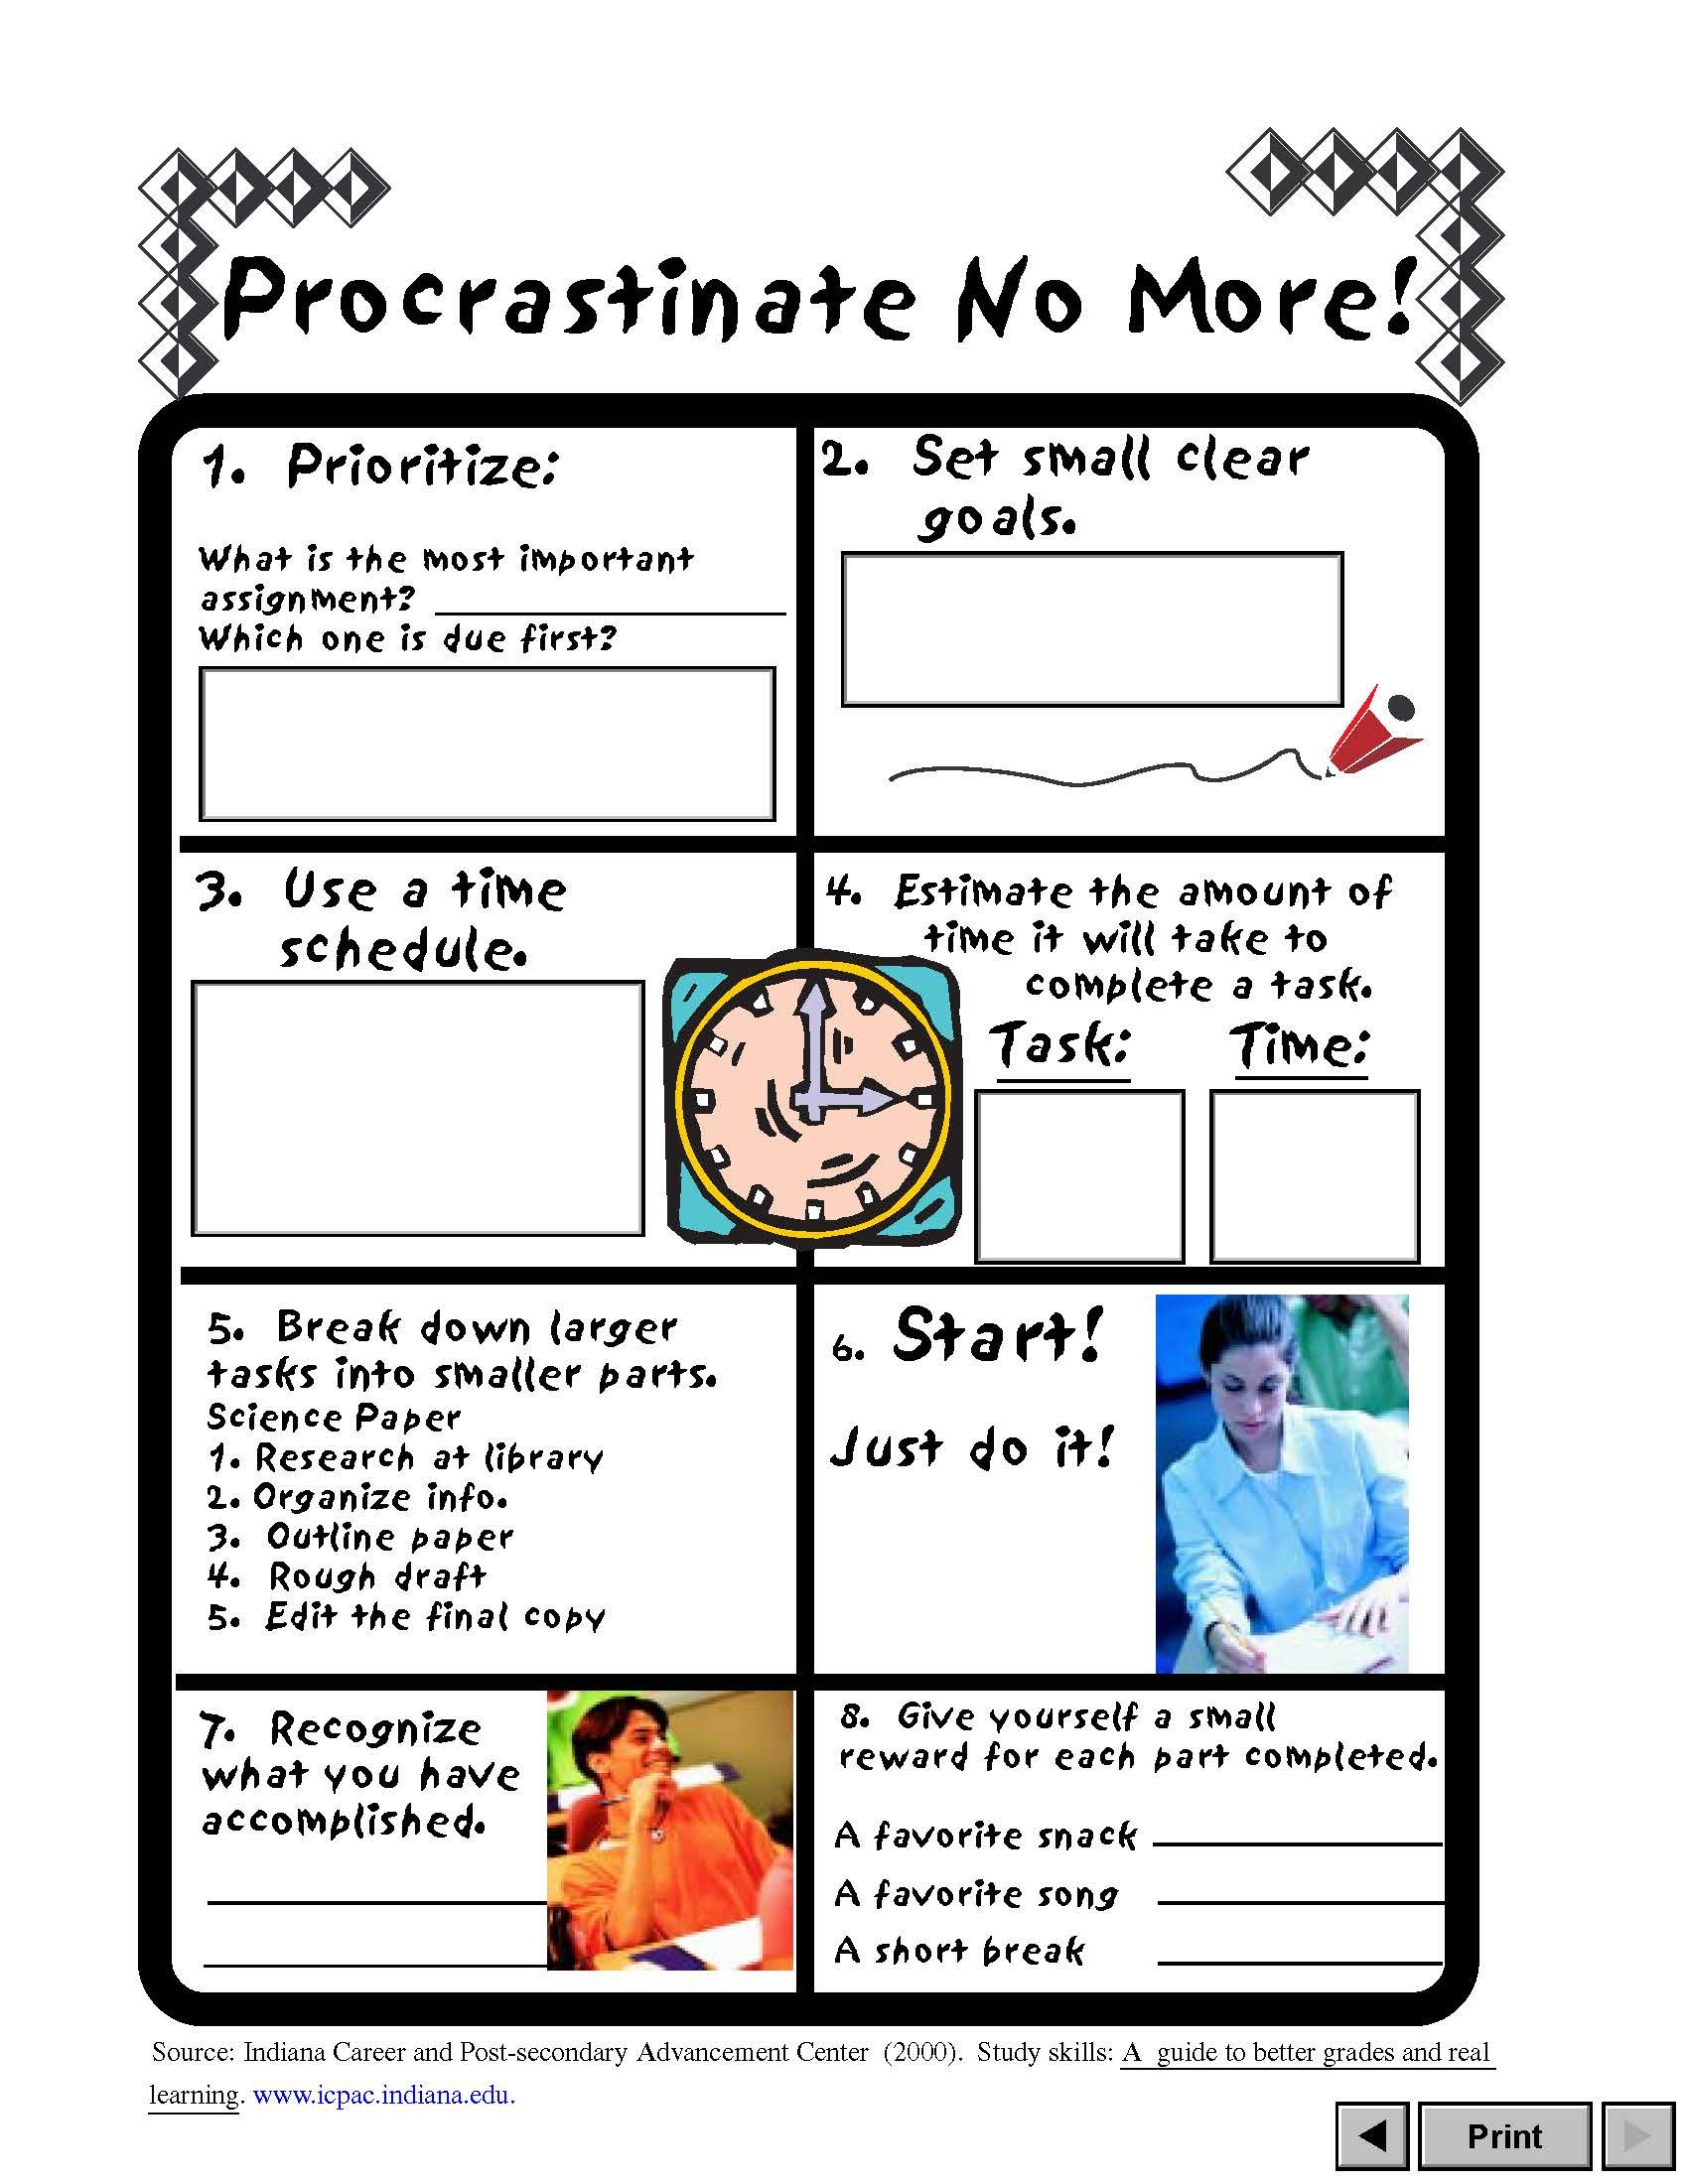 Worksheets Procrastination Worksheet procrastinate no more va career view a worksheet to help prioritize schedule